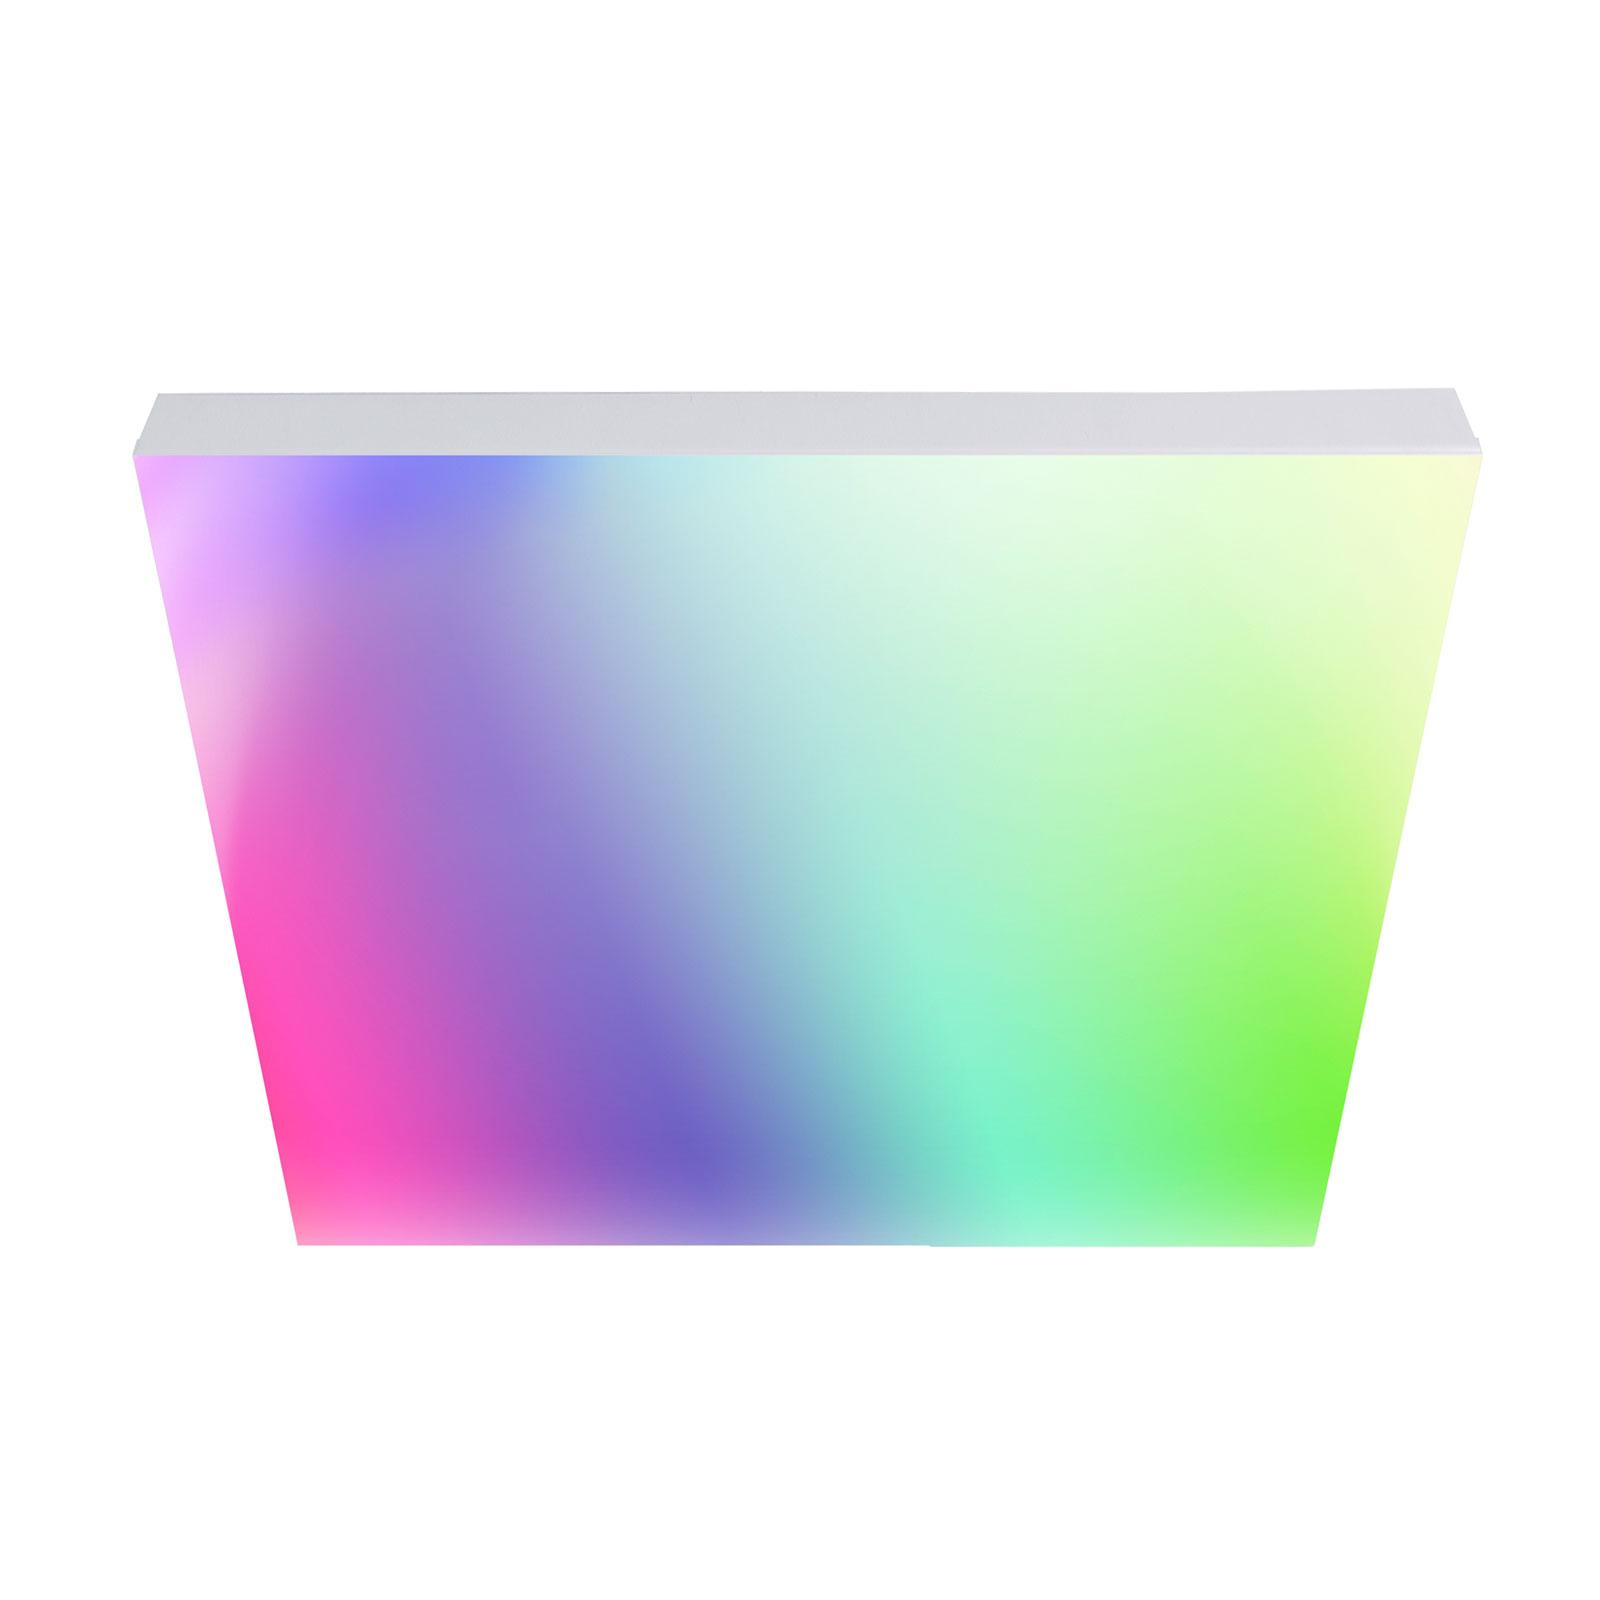 Müller Licht tint Aris LED-panel 30 x 30 cm RGBW